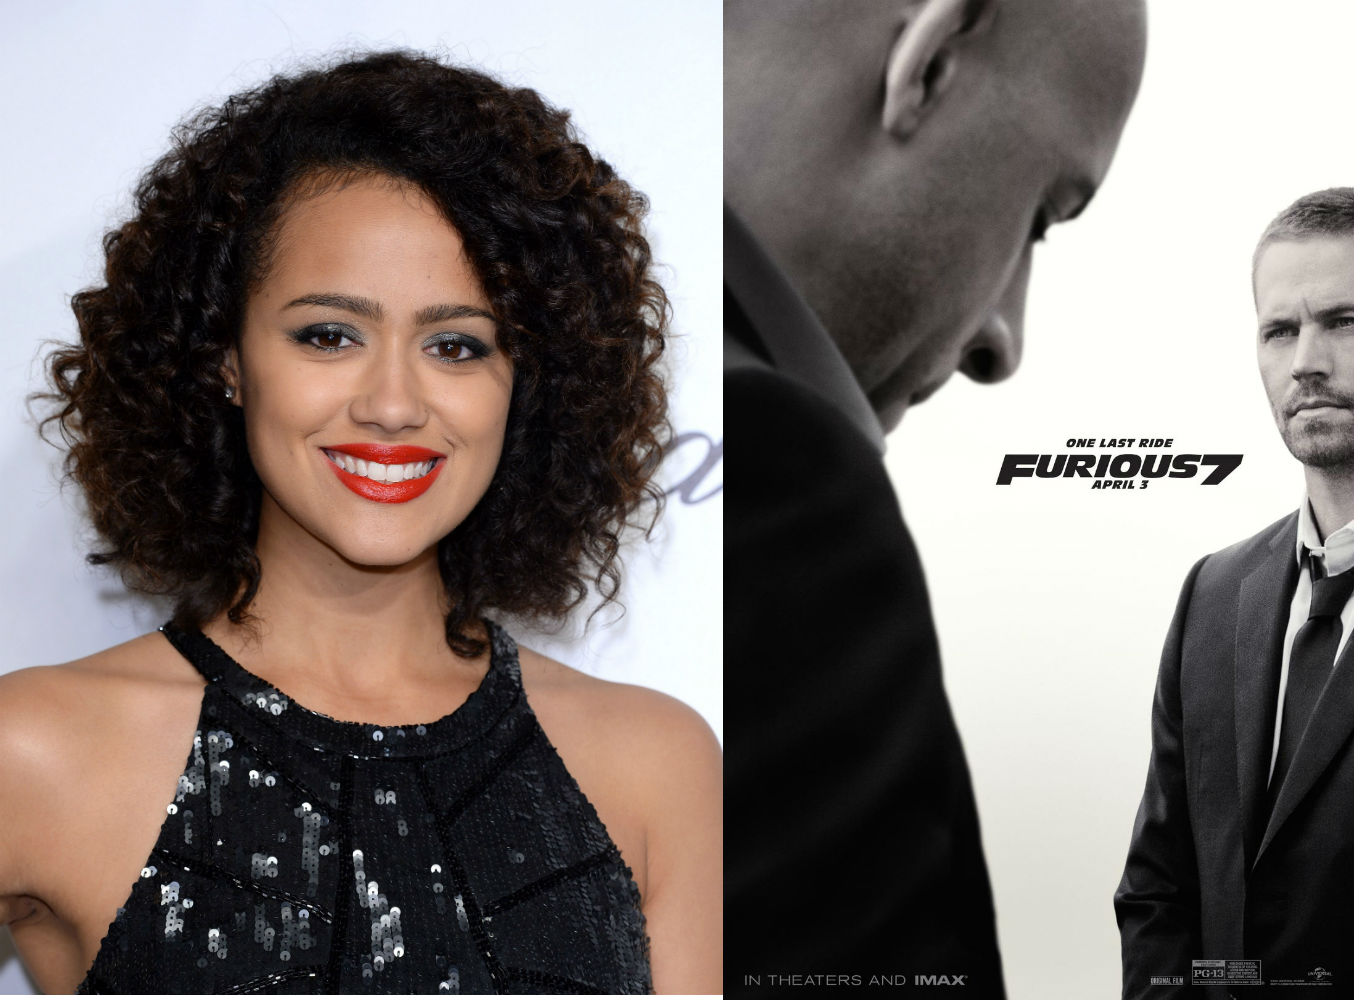 Nathalie Emmanuel Talks Furious 7 Blackfilm Com Black Movies Television And Theatre News